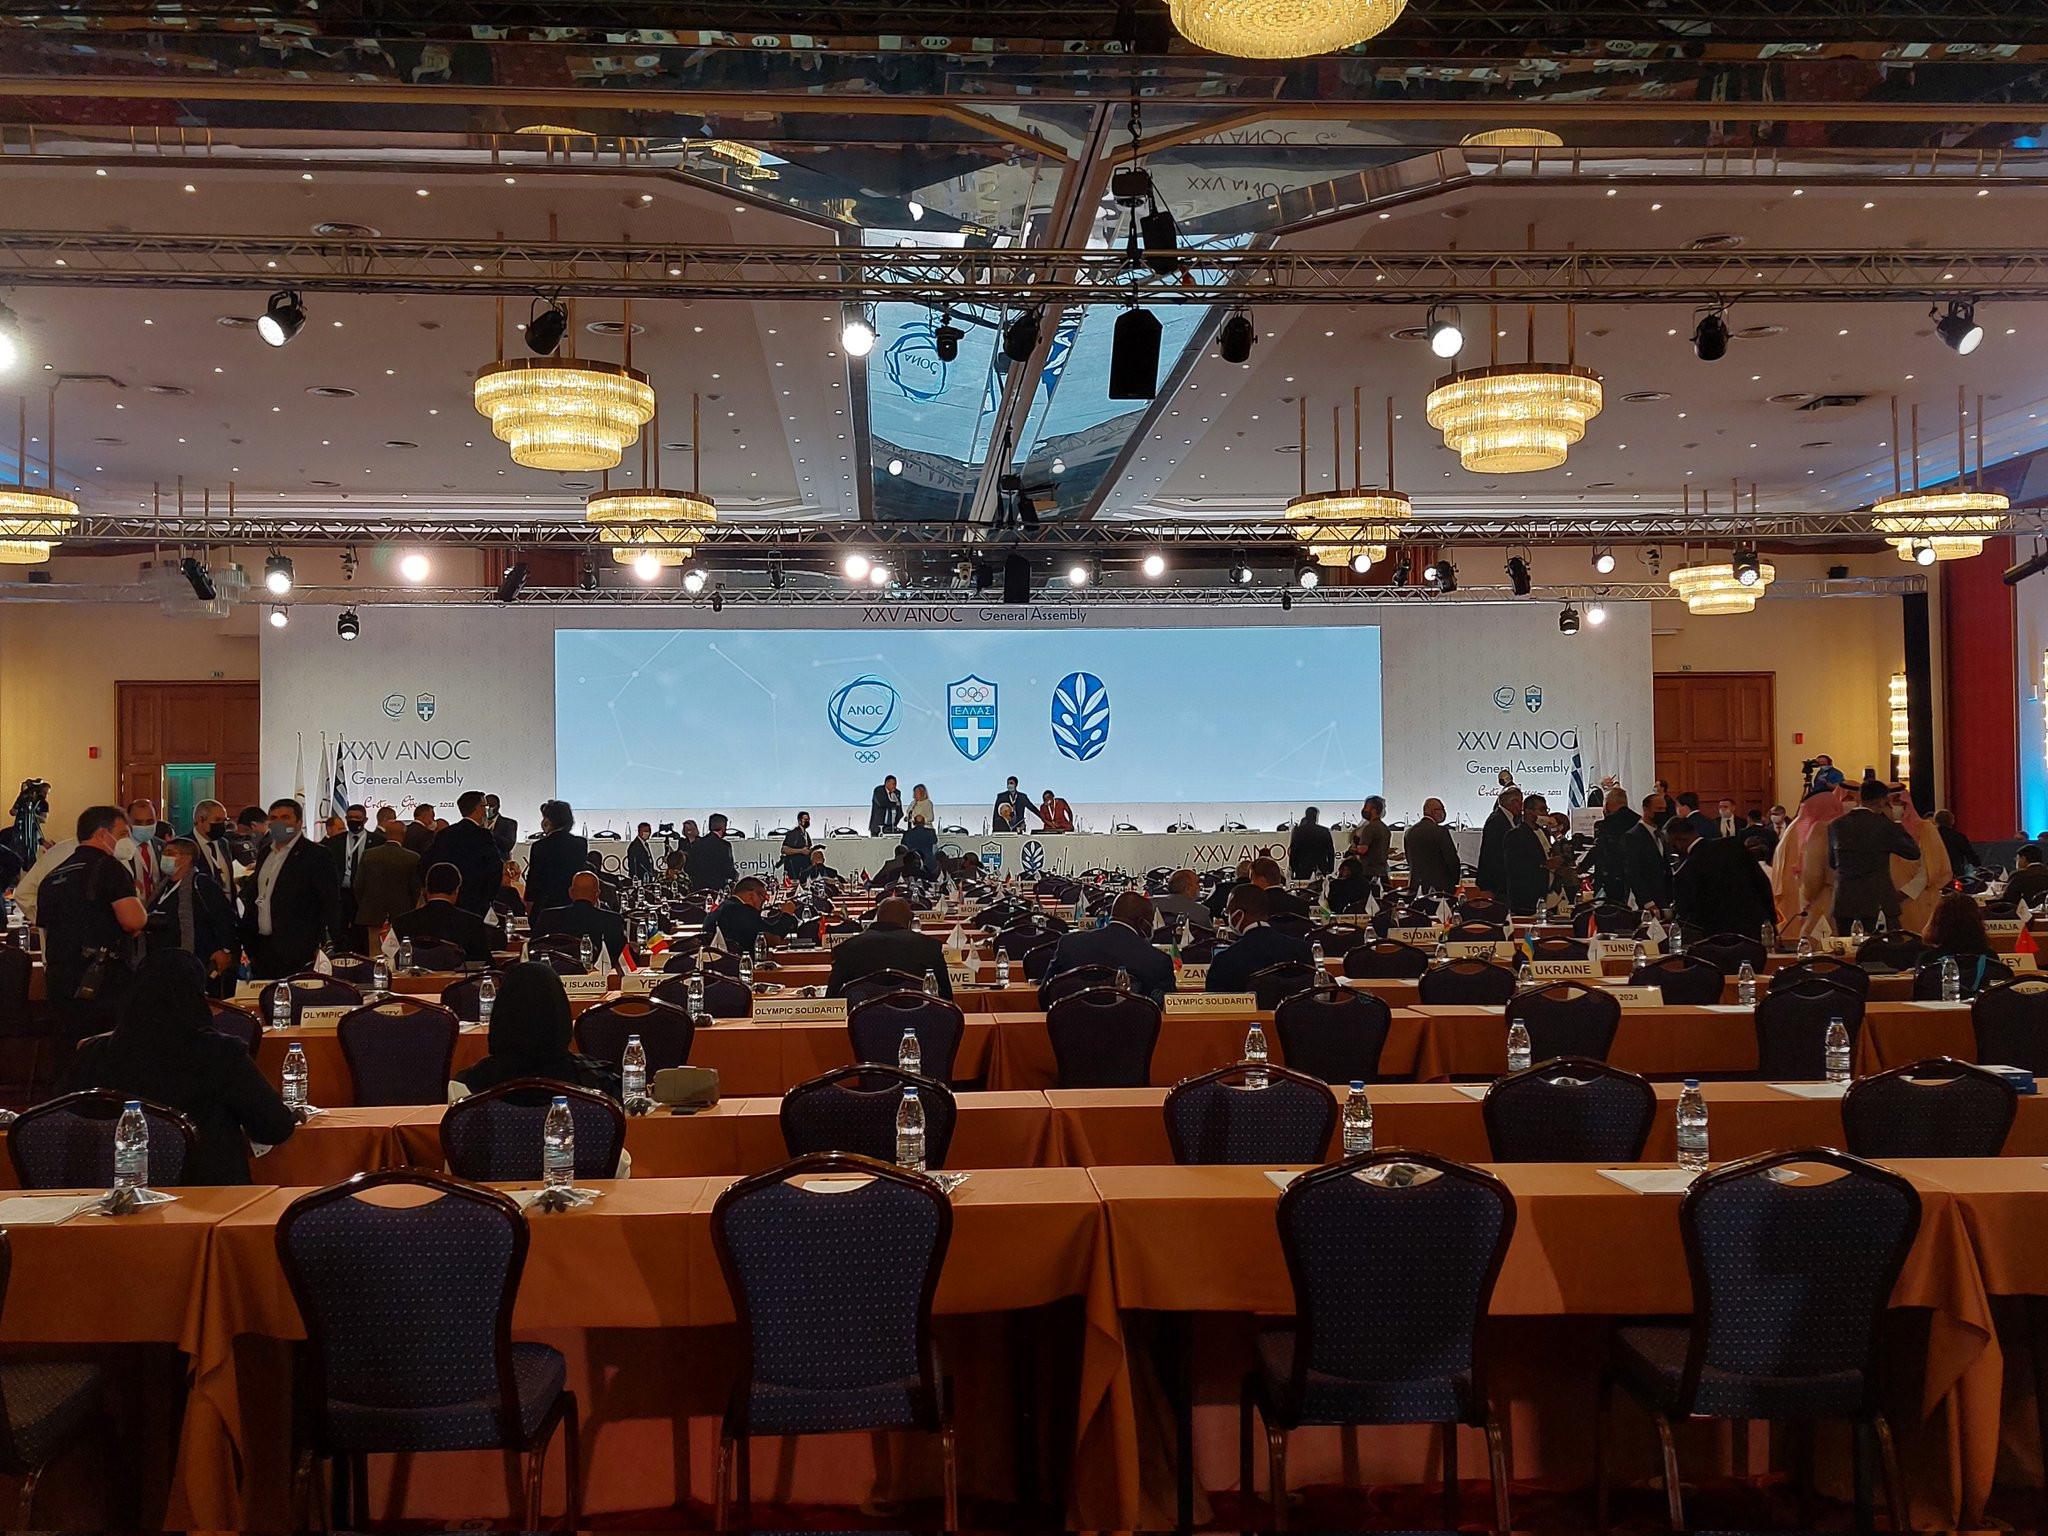 Giant subsidy cut leaves ANOC finances weakened